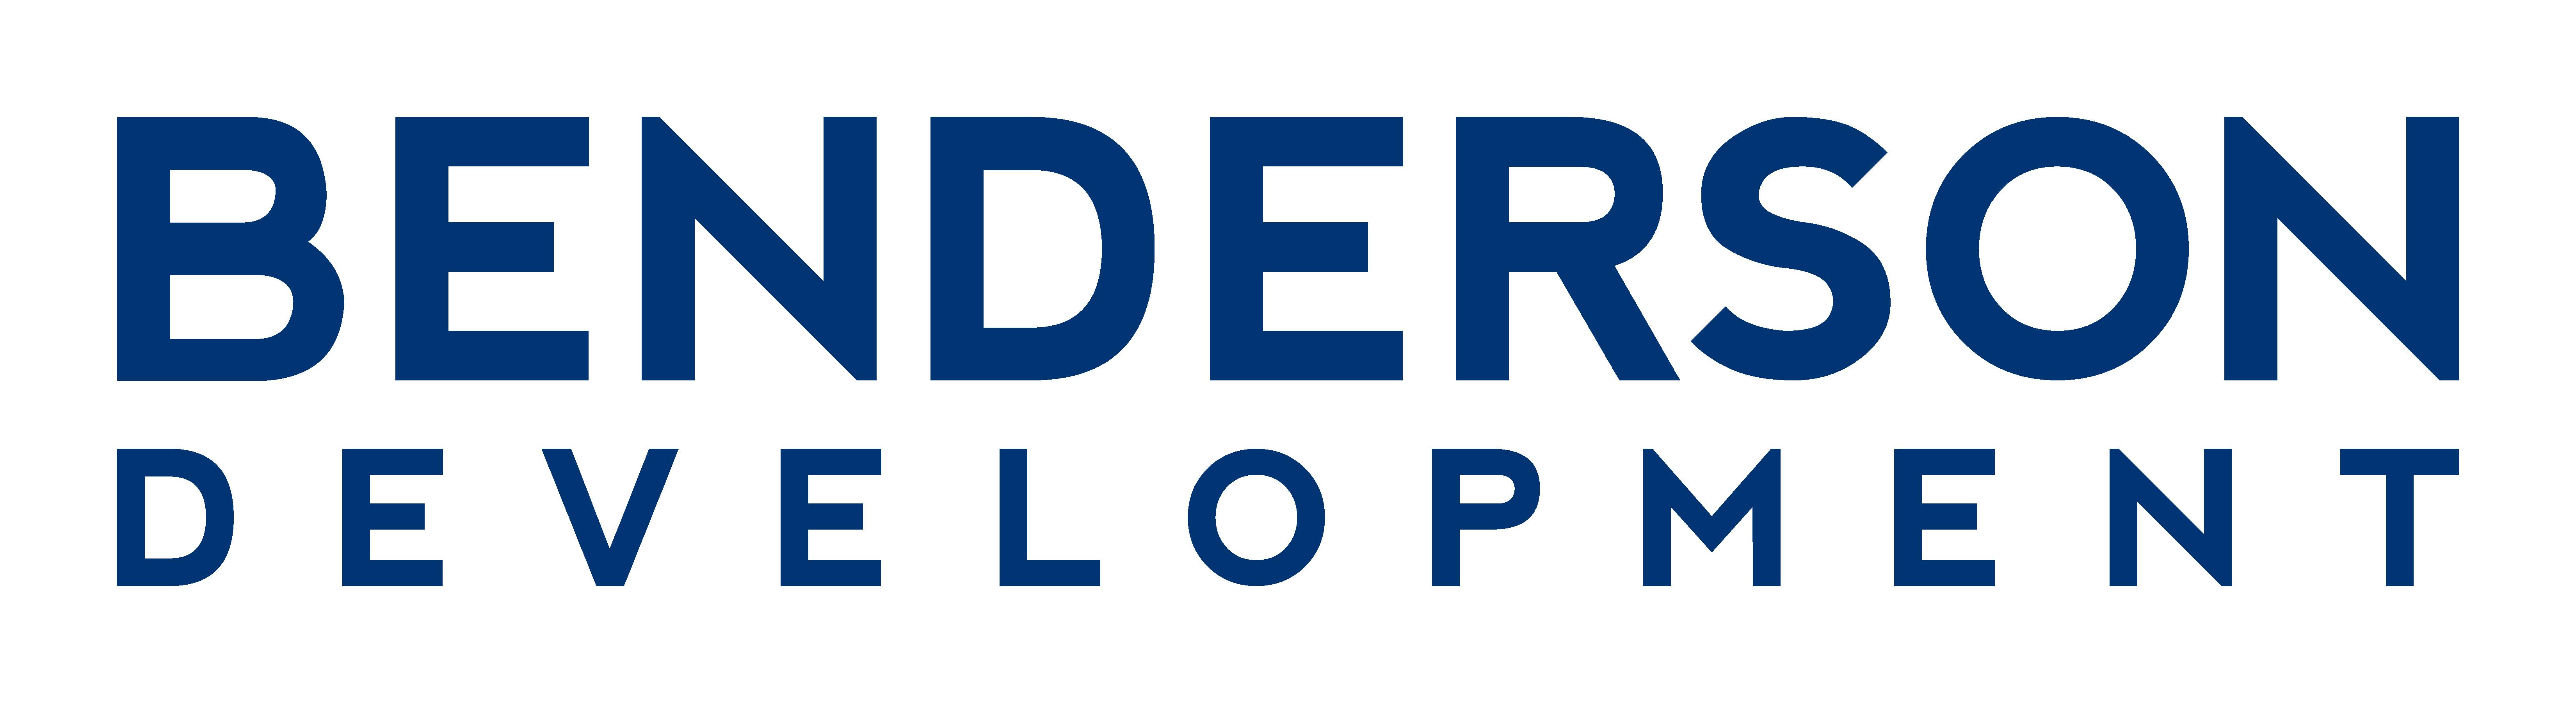 Benderson Development_LOGO_BLUE